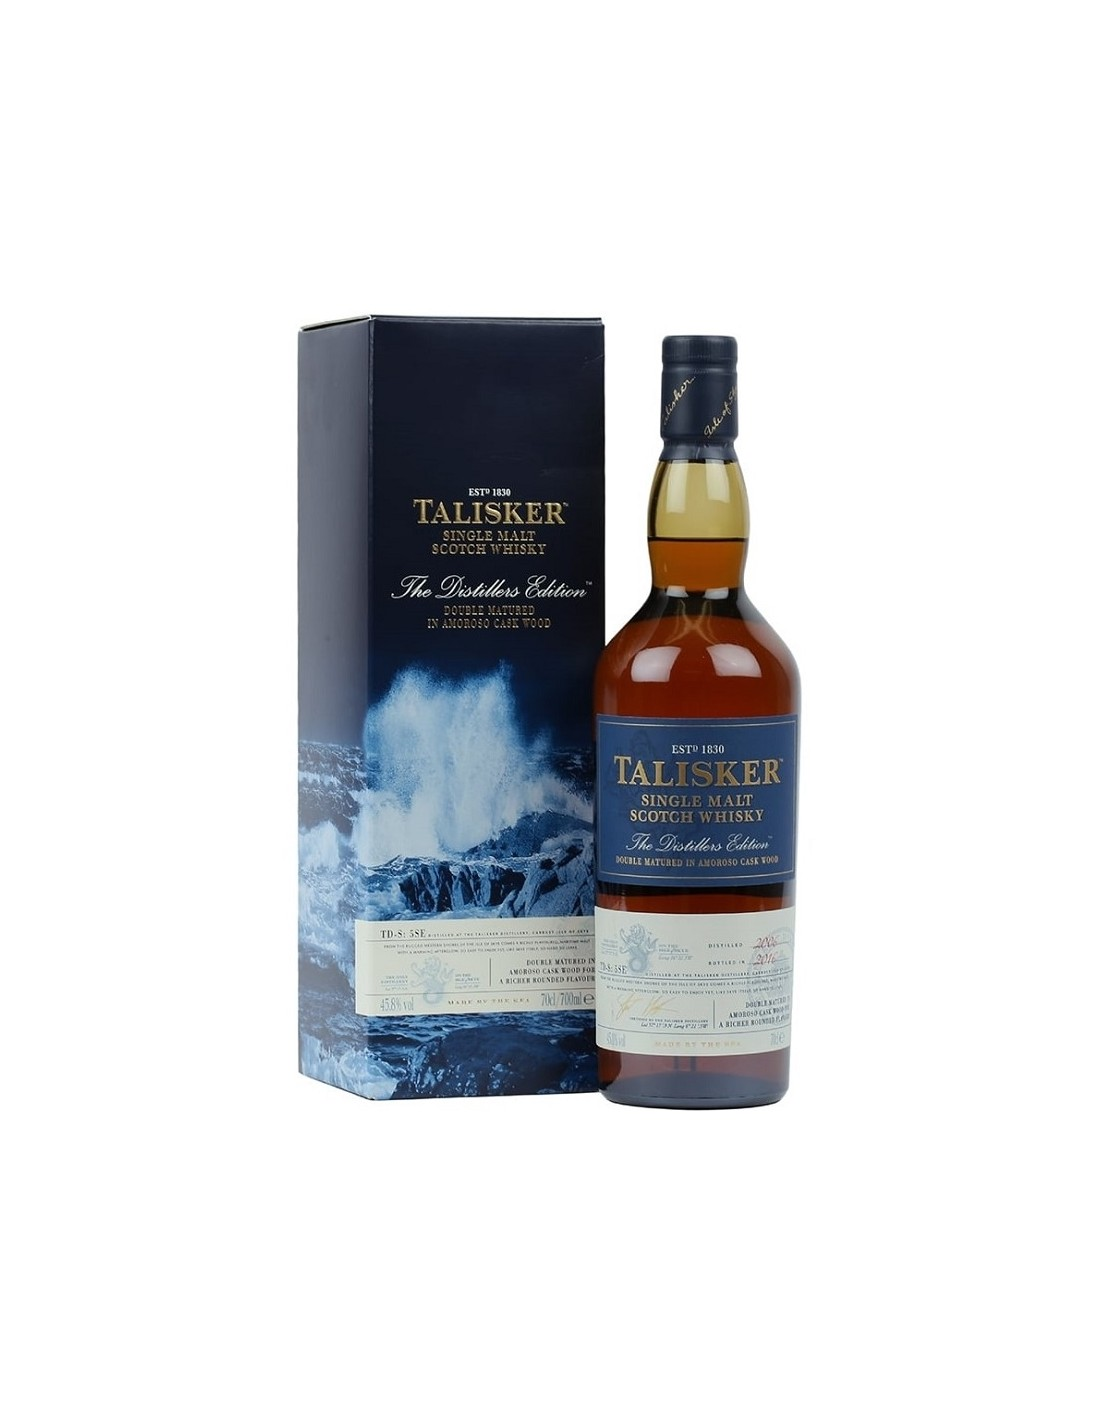 Whisky Talisker Distiller's Edition, 45.8% alc., 0.7L, Scotia